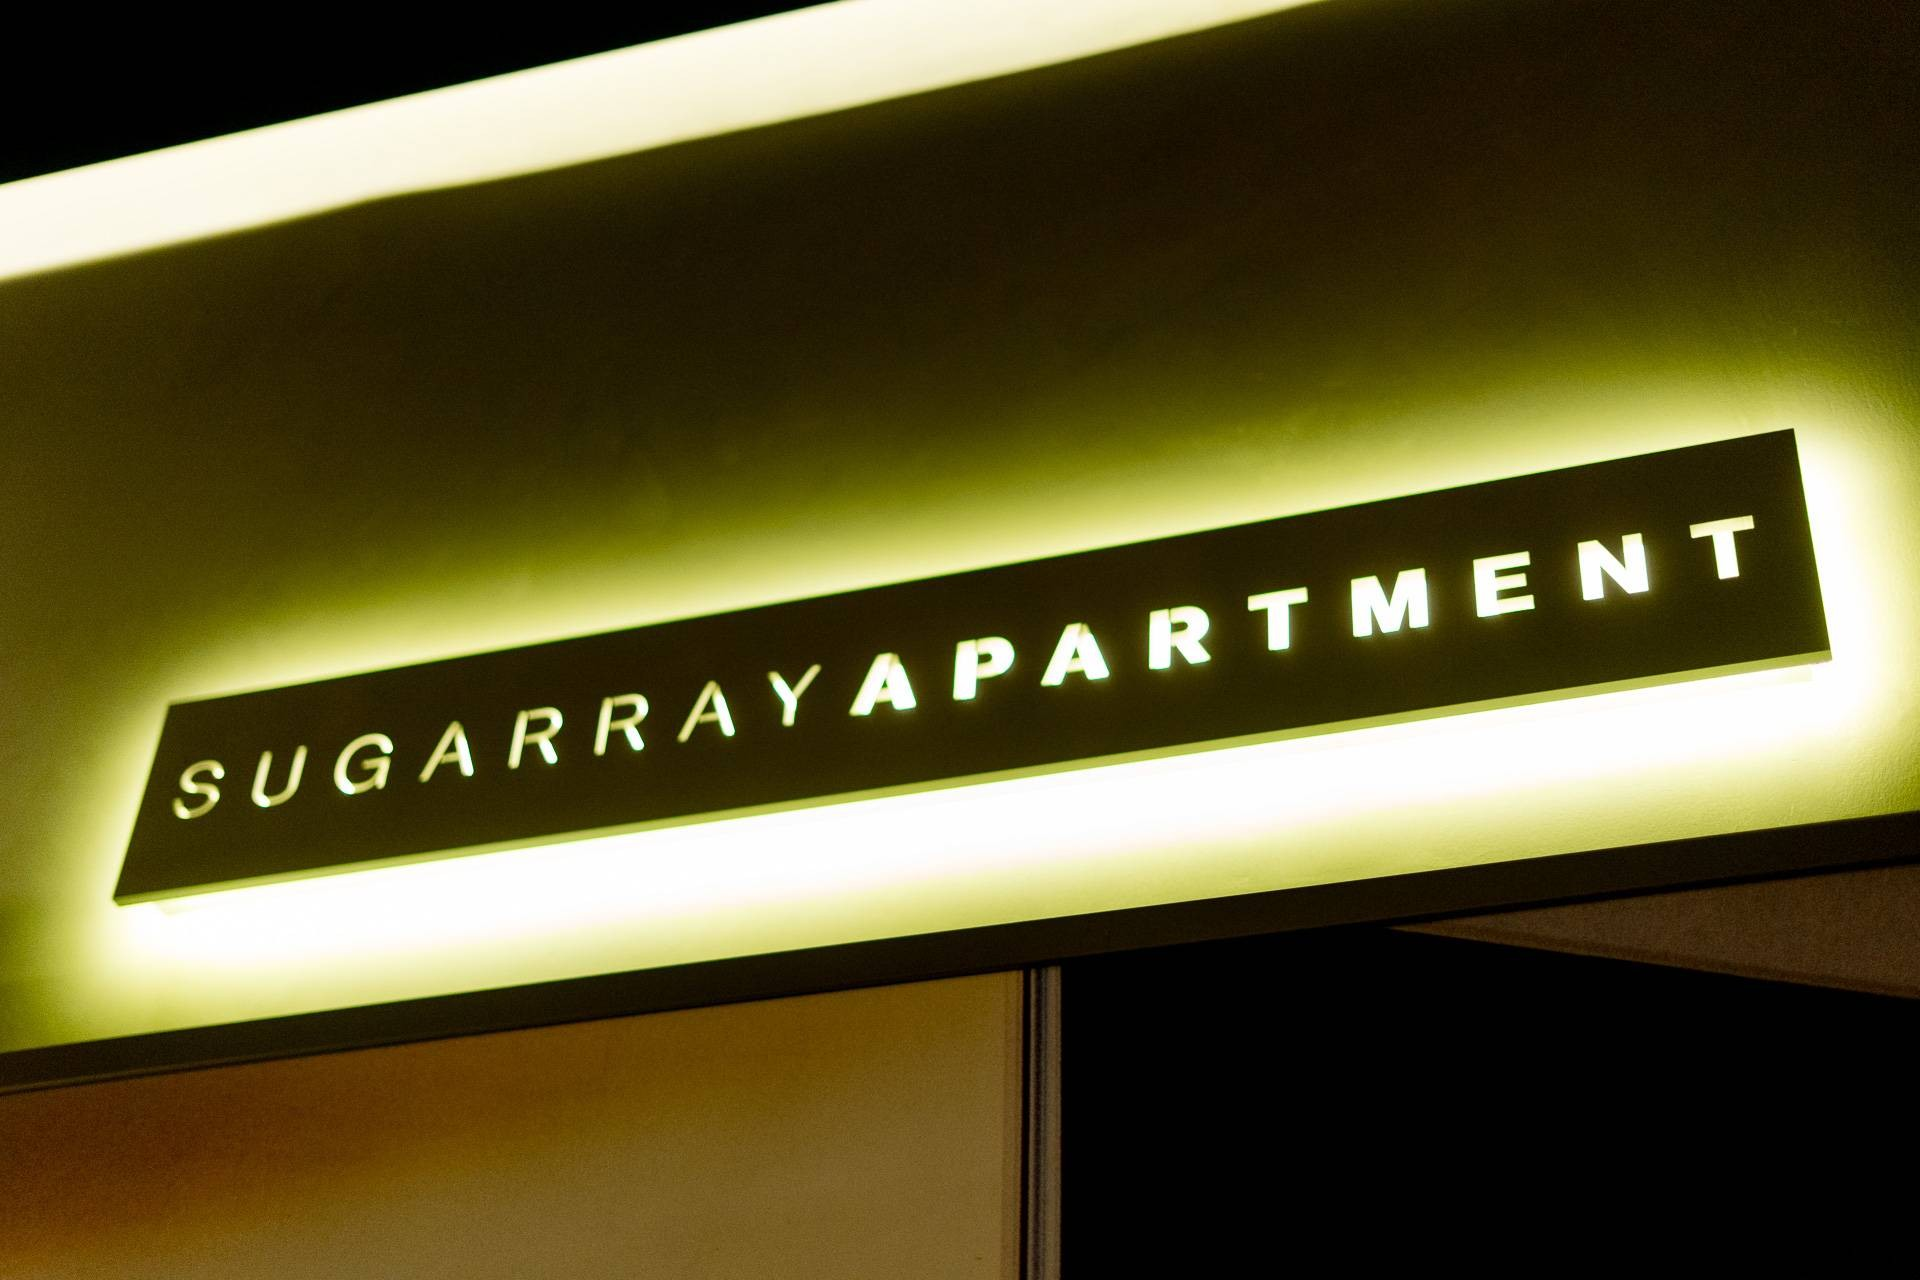 Sugarray Apartment